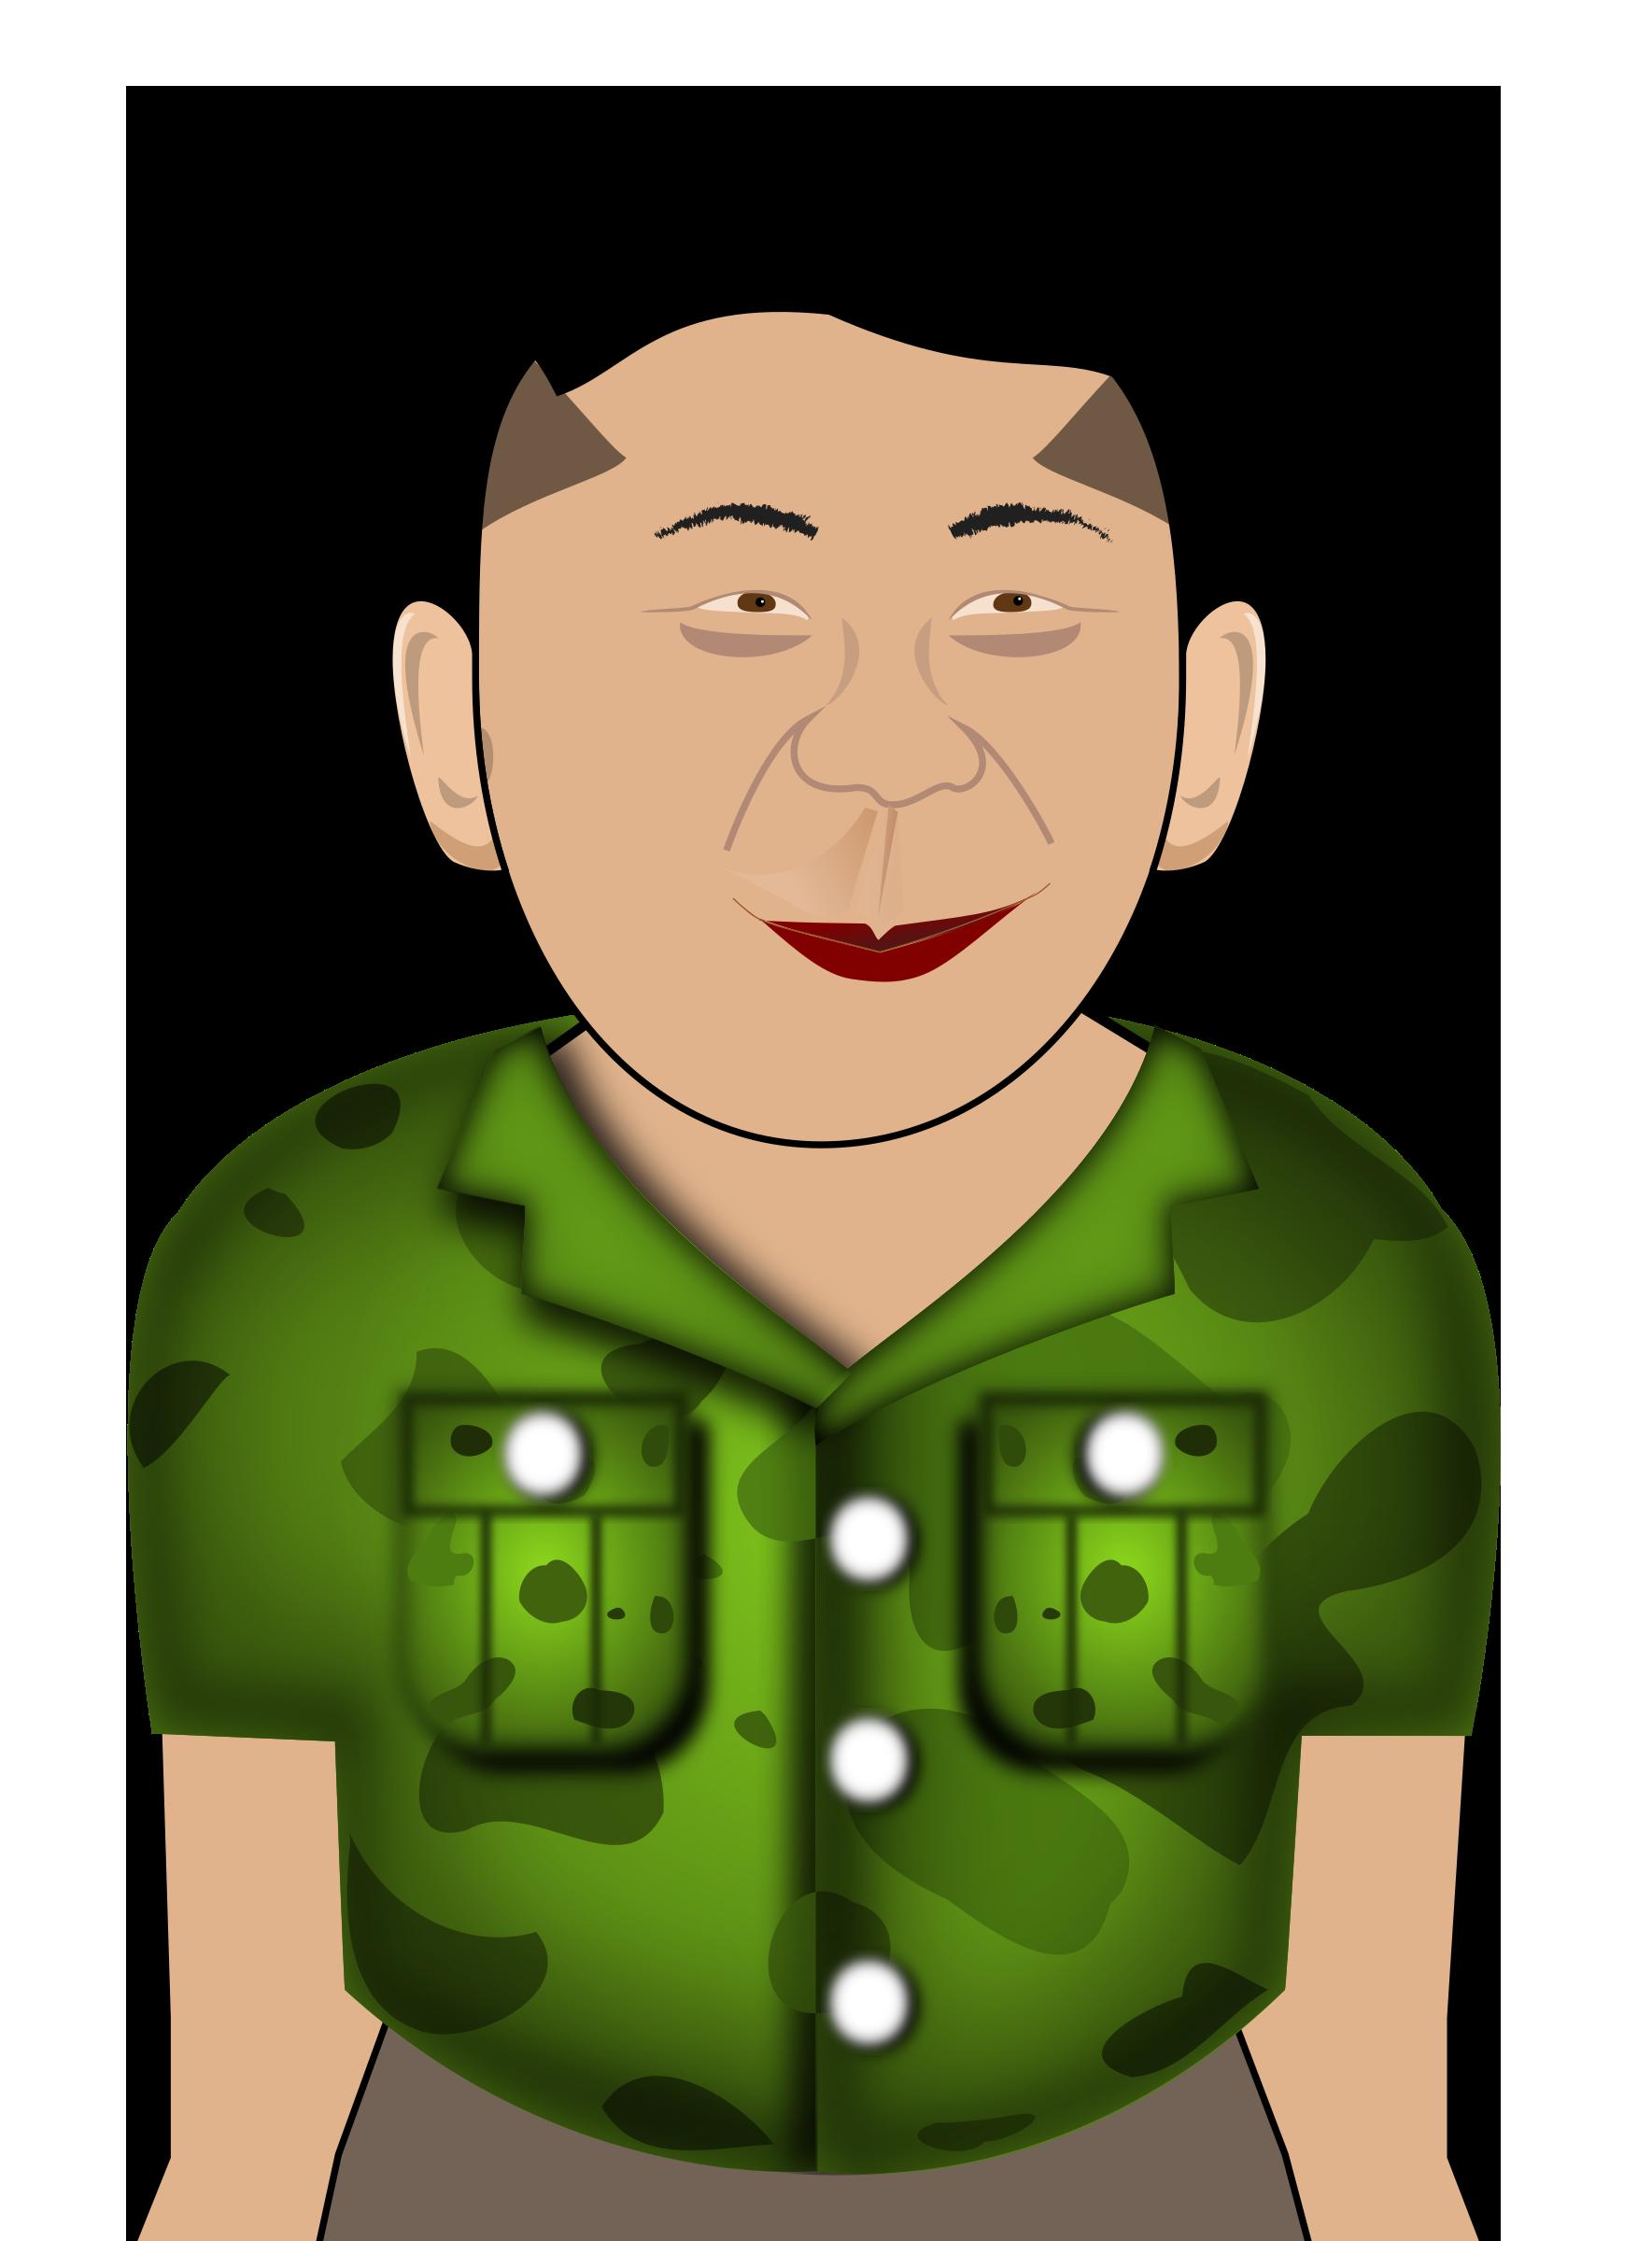 Kim Jong Un in a Green Shirt vector clipart image.